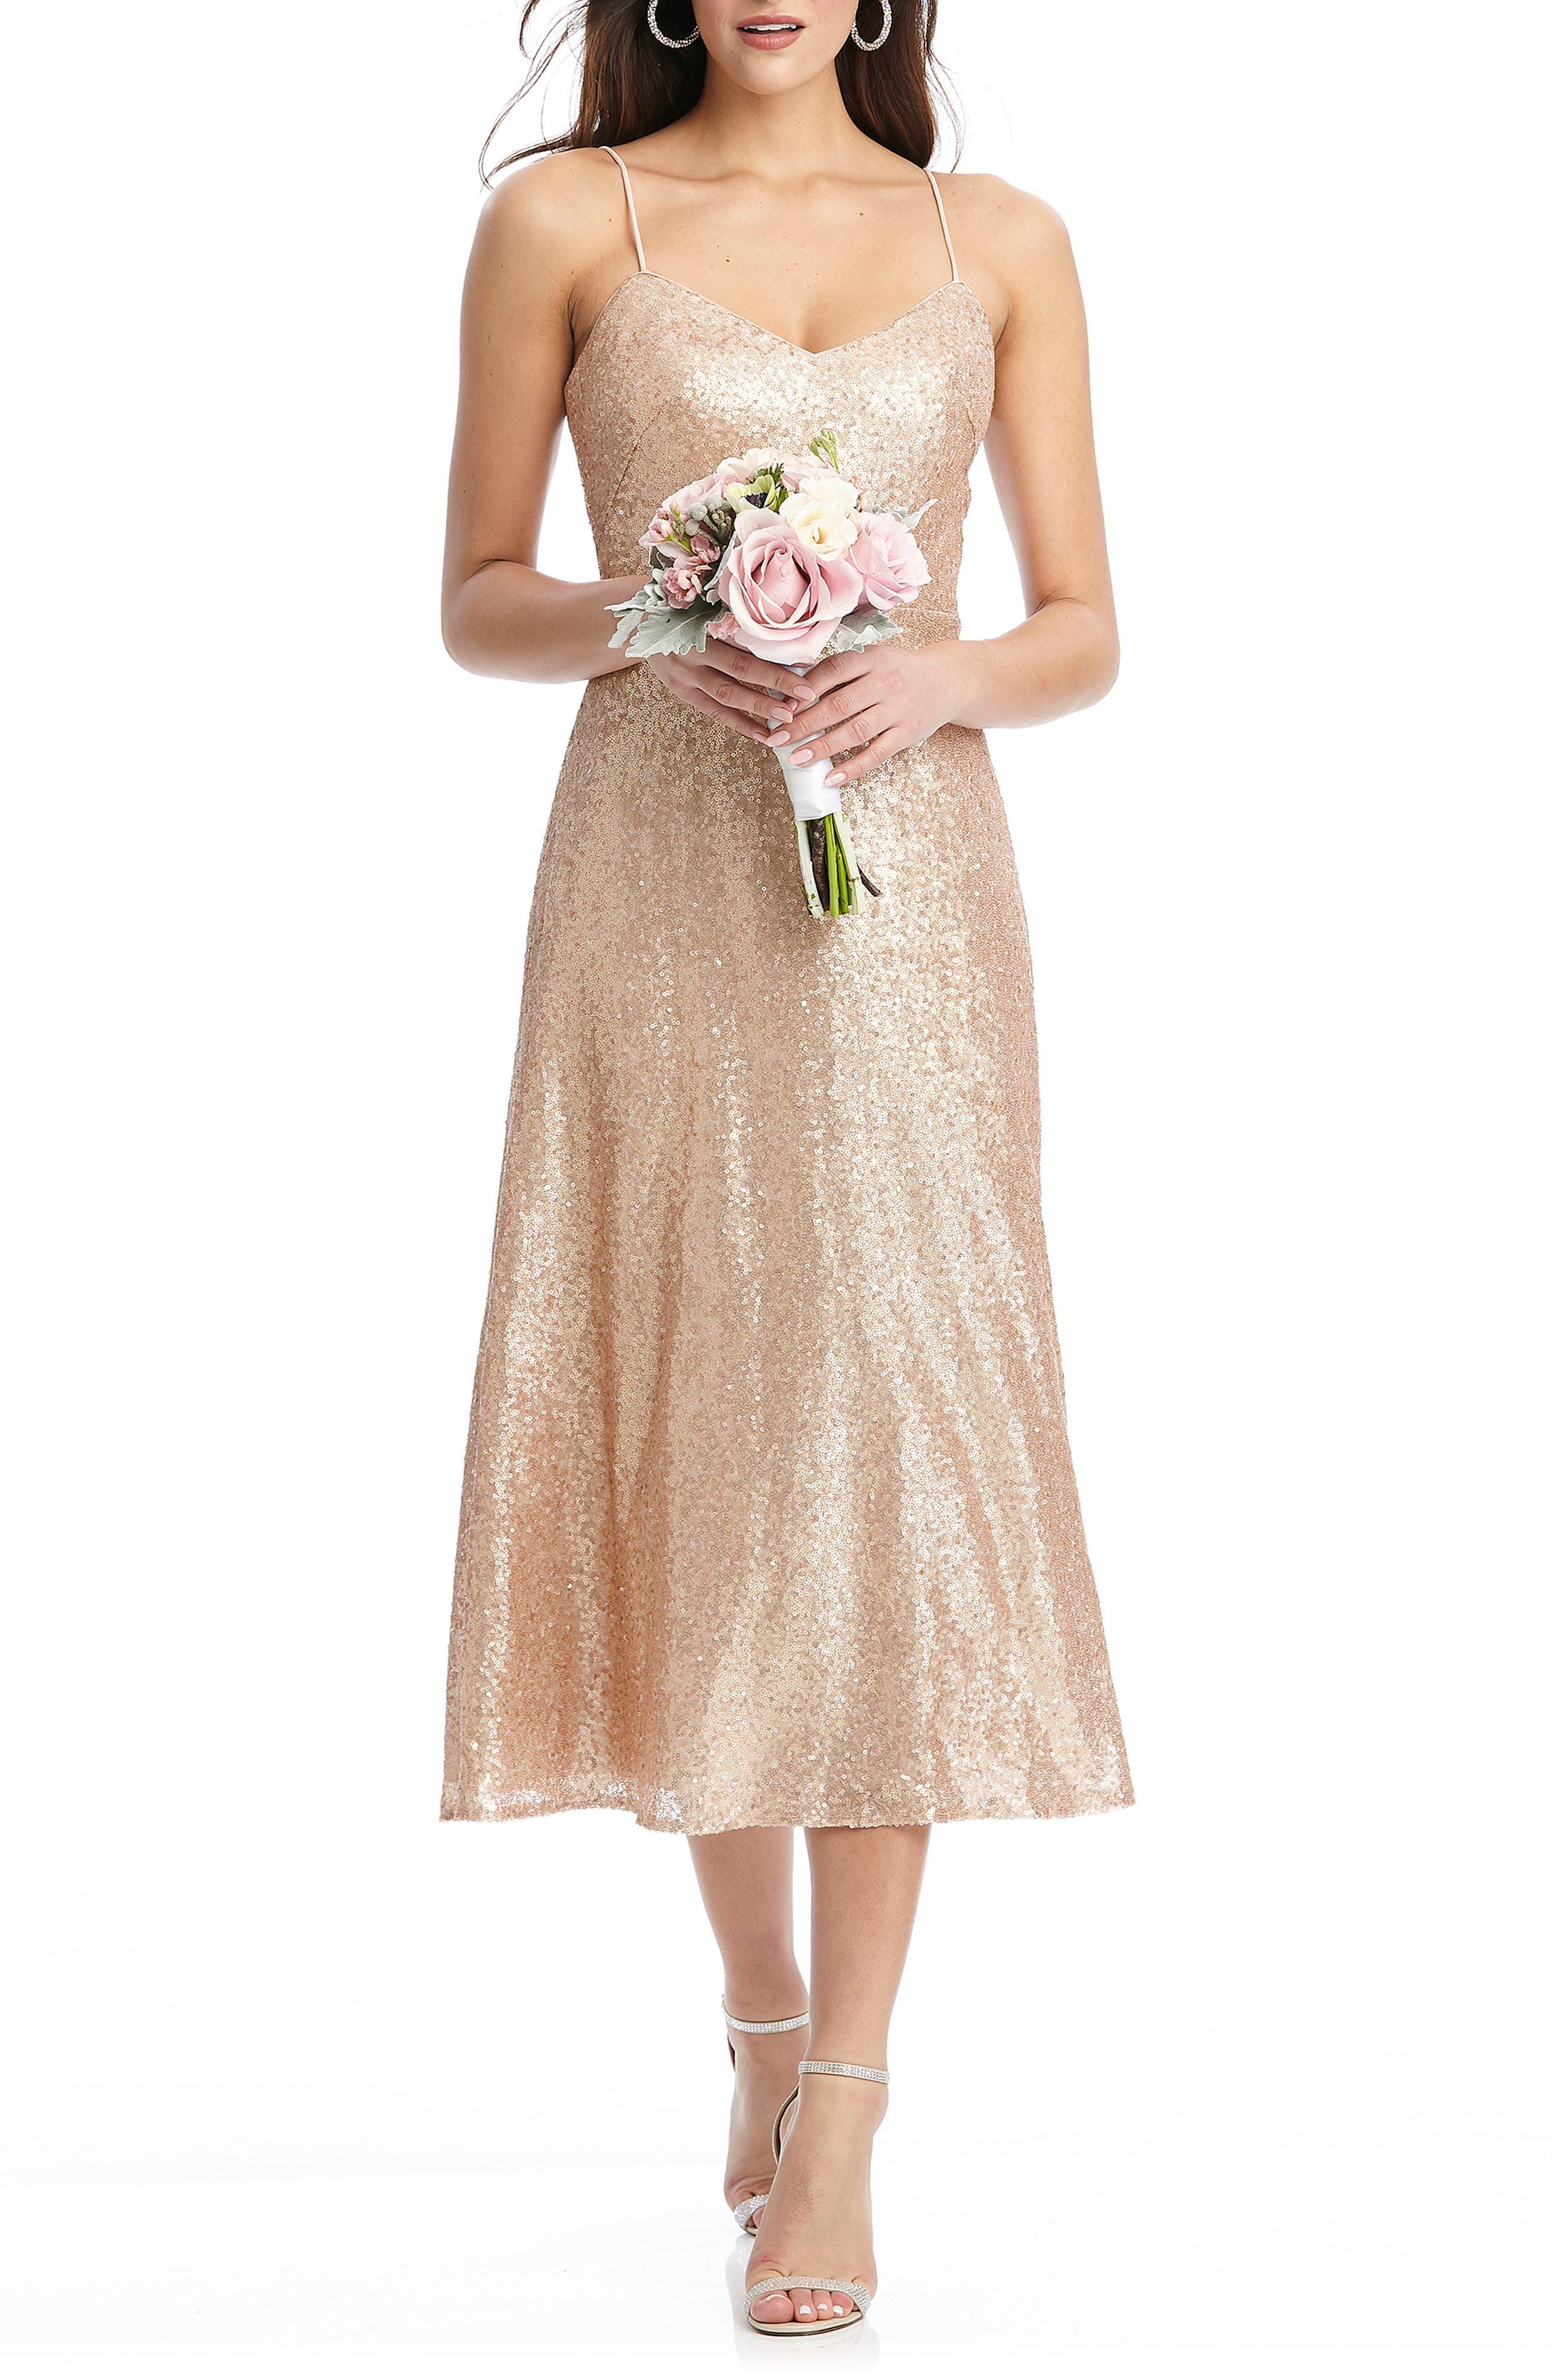 70s Prom, Formal, Evening, Party Dresses Womens Dessy Collection Elle Sequin Cocktail Dress $263.00 AT vintagedancer.com